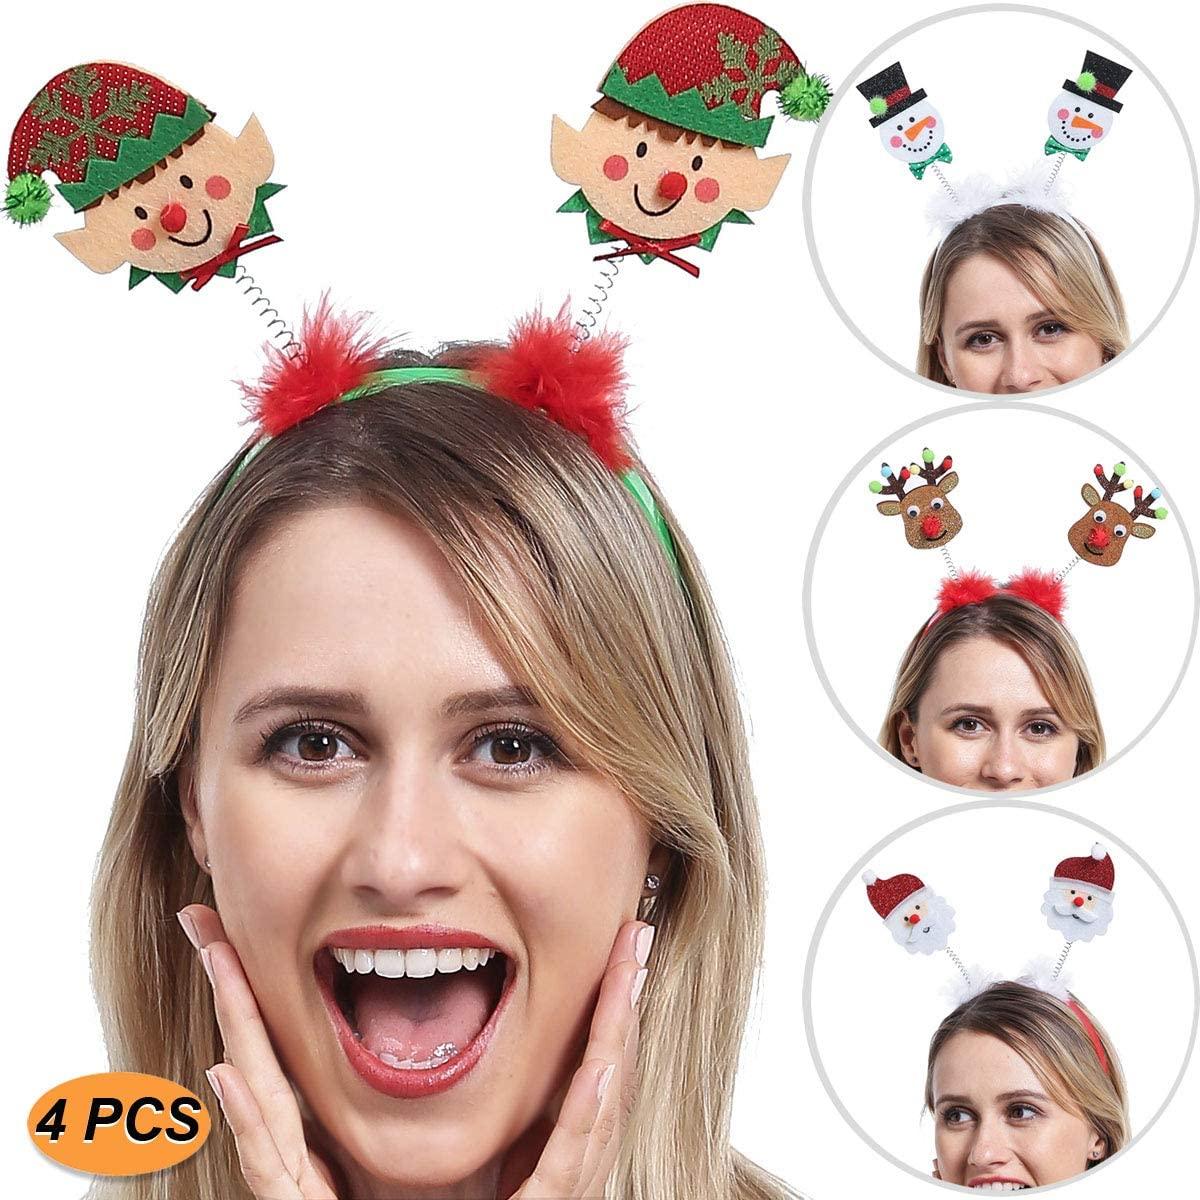 ADJOY Christmas Headbands for Kids Boys Girls Teenagers Women Men - Santa's Little Helper Headwear Snowman Santa Claus Reindeer Headband - One Size Fits All (4 PCS) Green